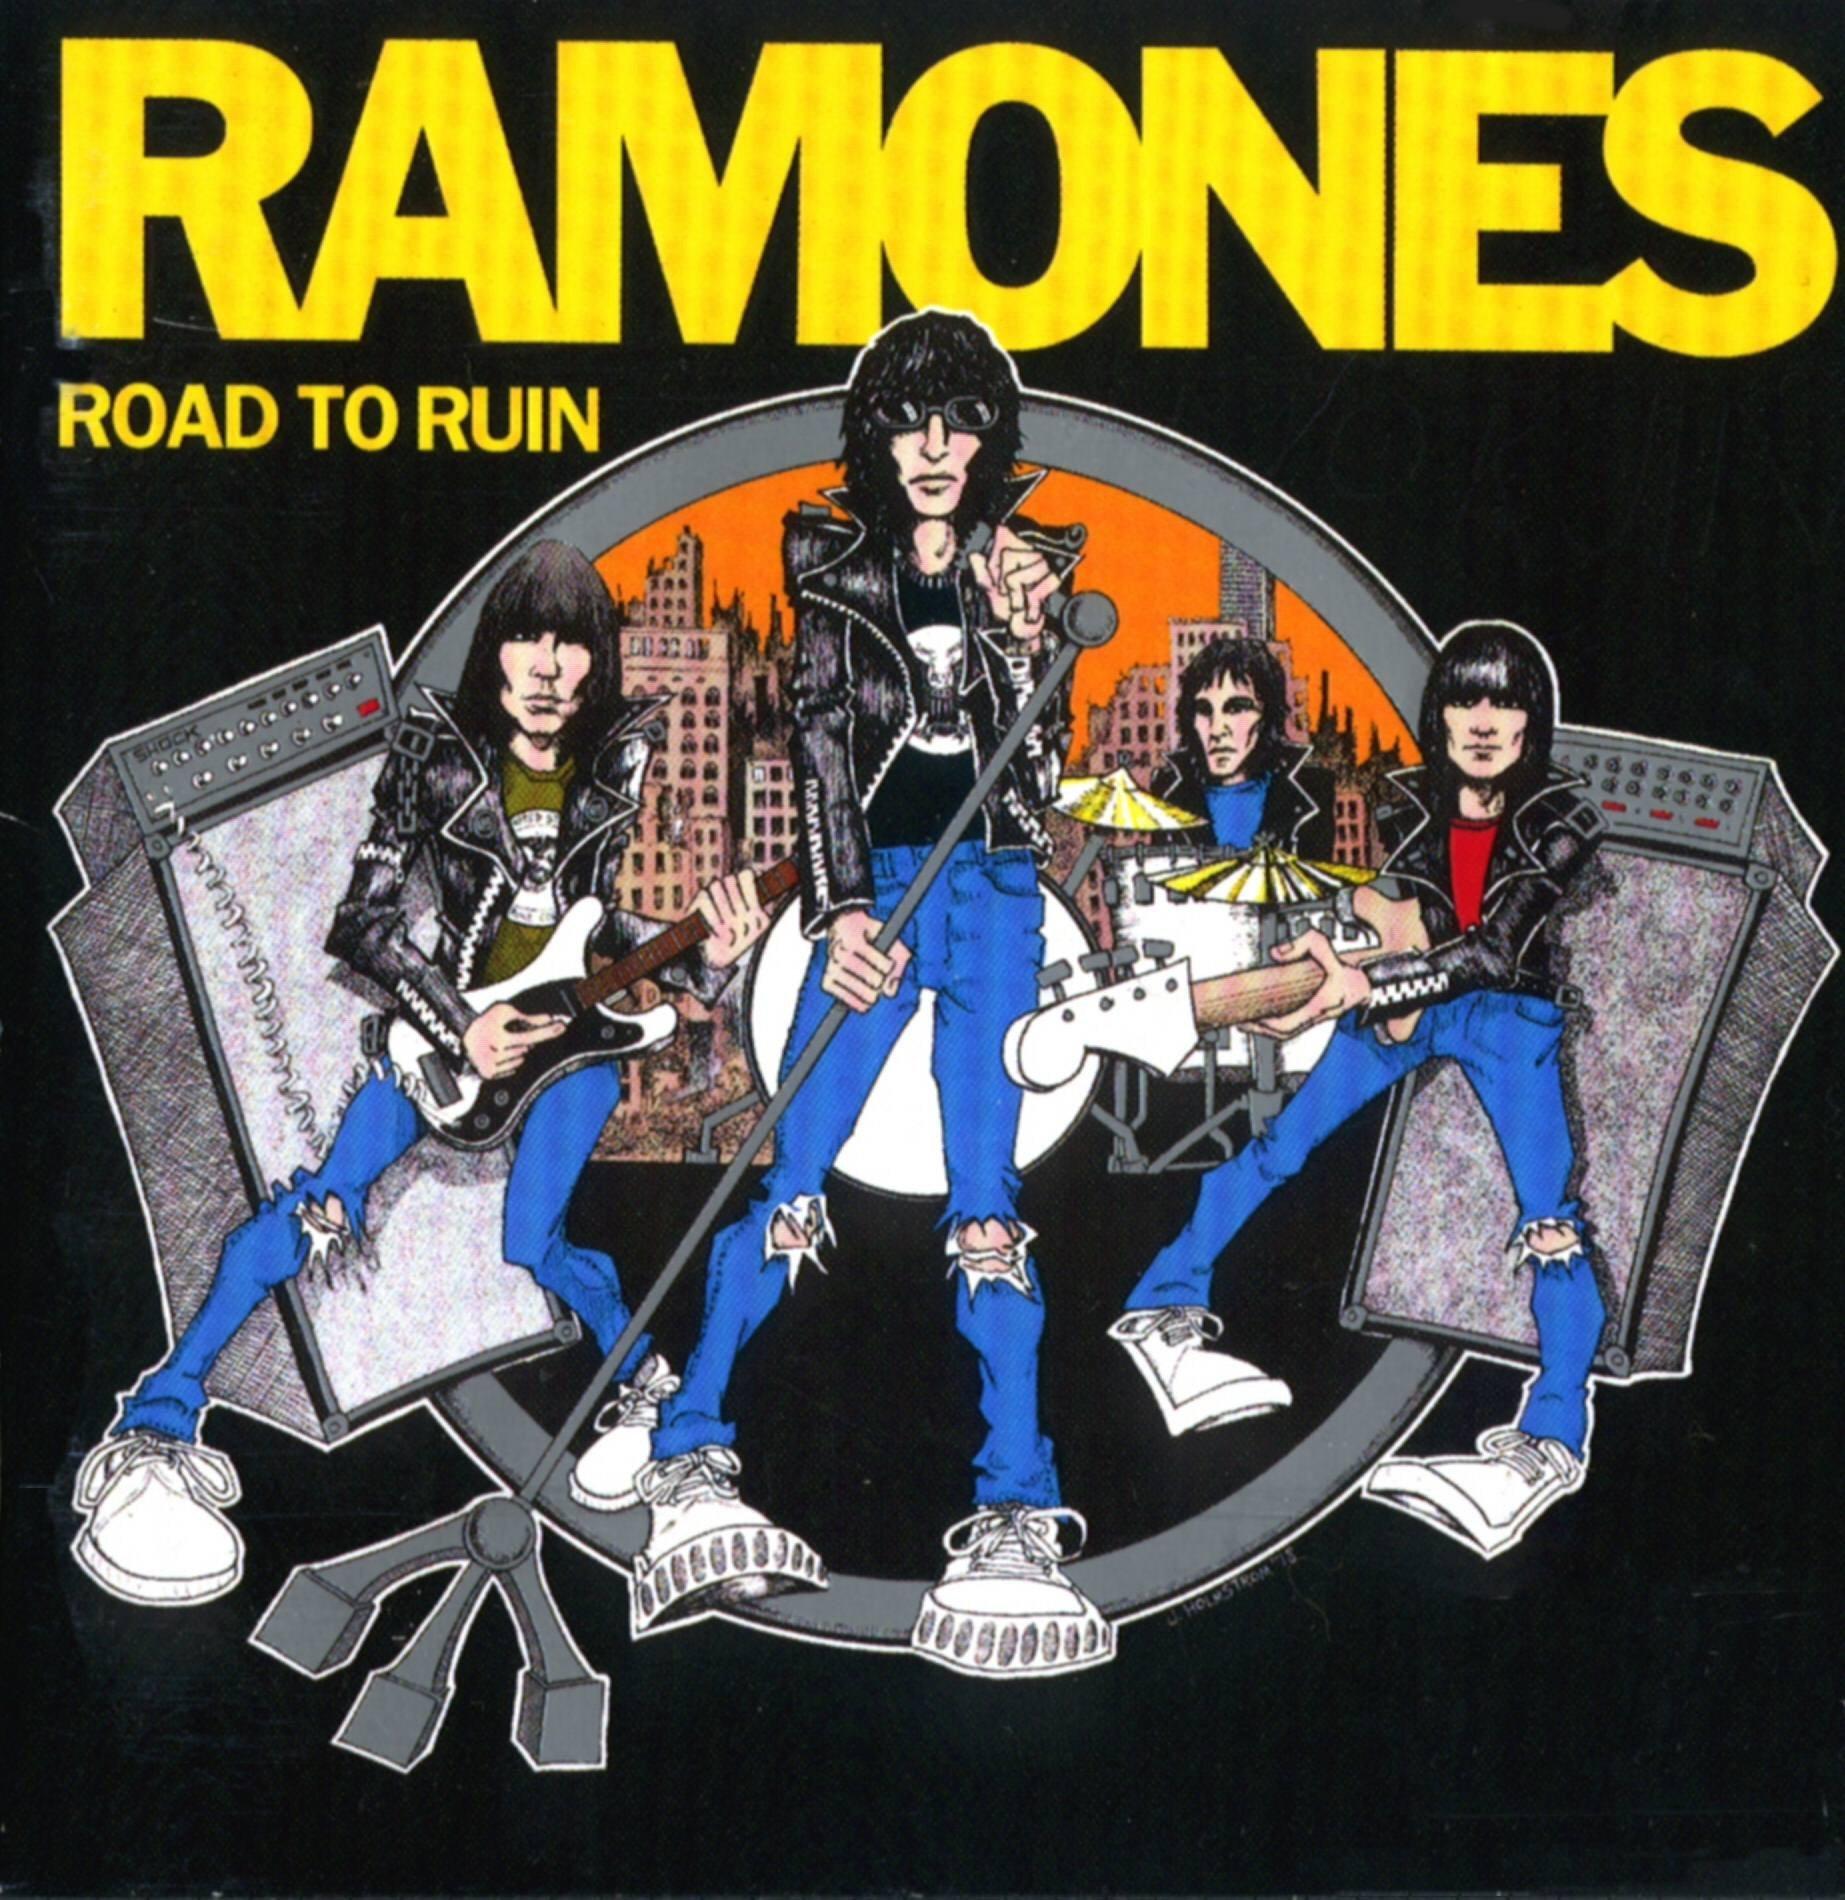 Ramones - Road to Ruin - CD – Rough Trade